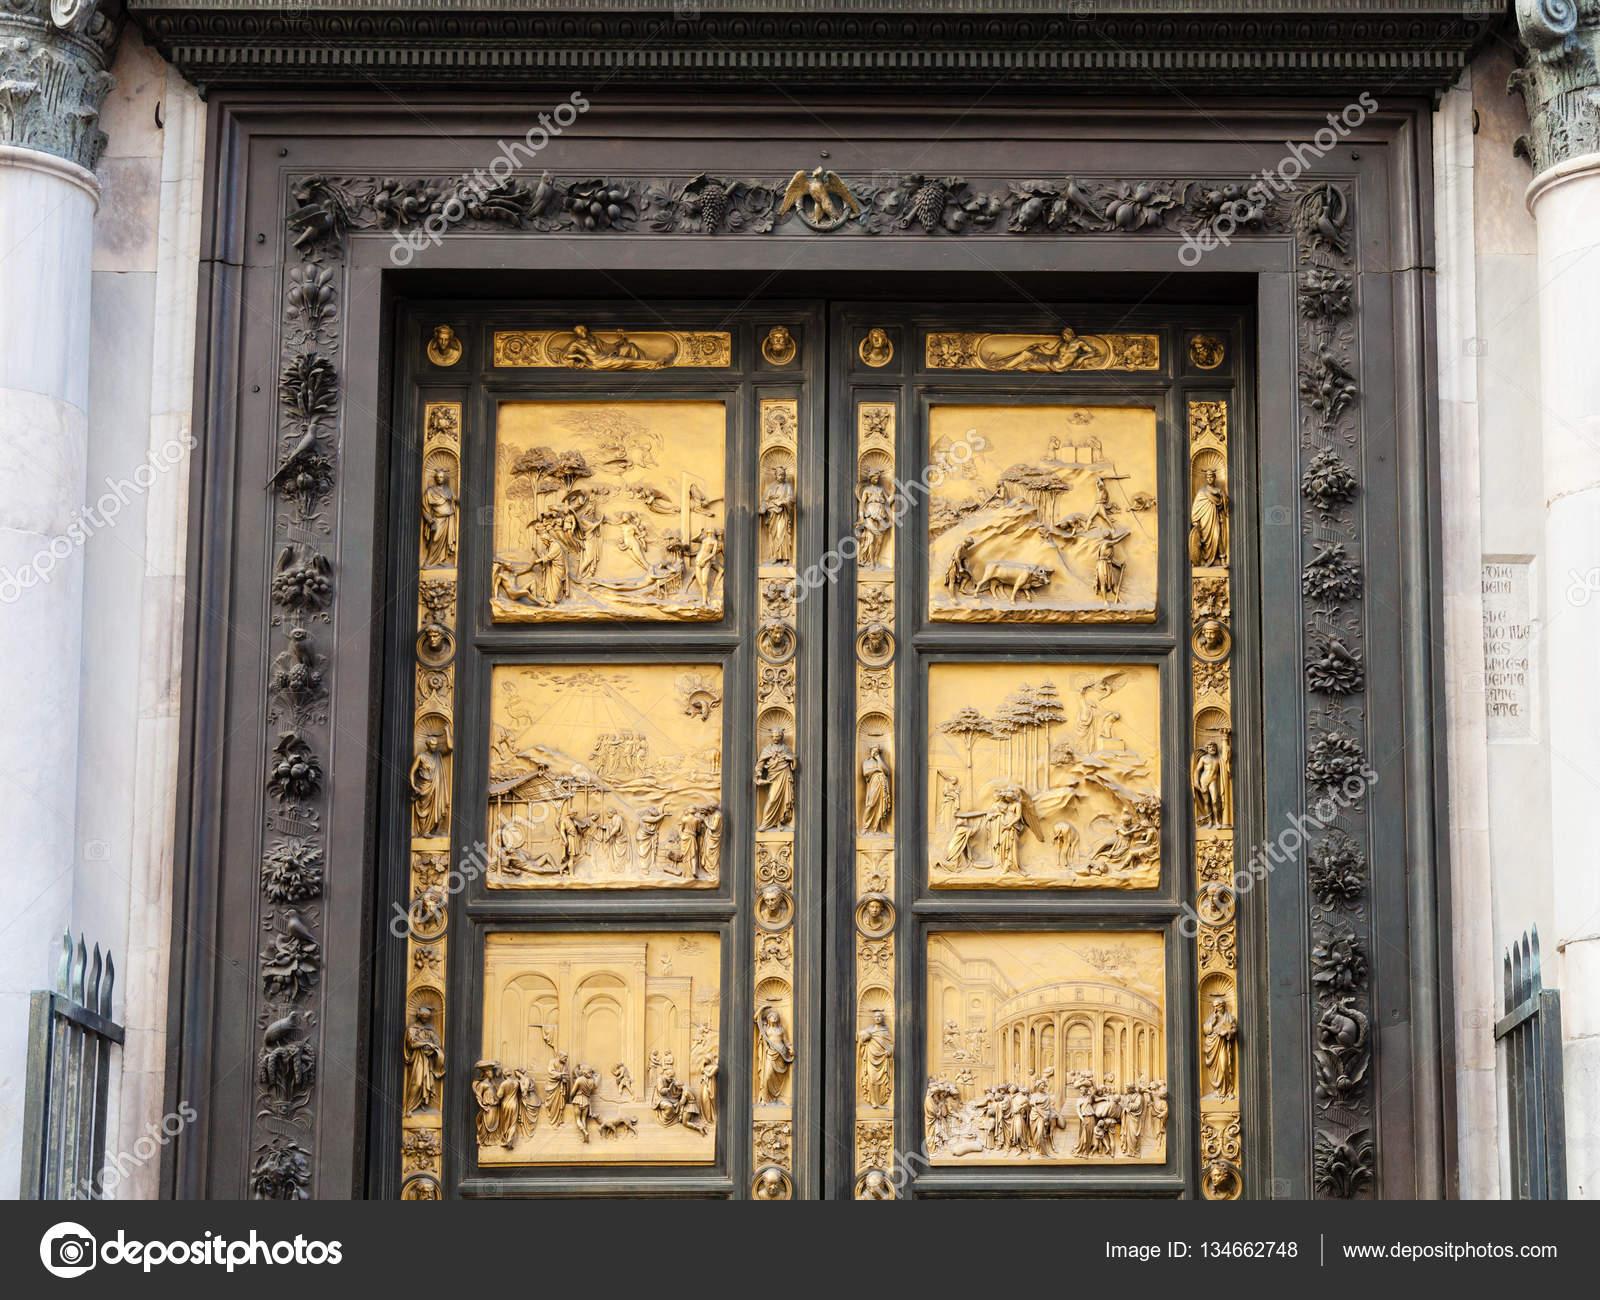 Outdoor East doors of Baptistery in Florence u2014 Stock Photo & outdoor East doors of Baptistery in Florence u2014 Stock Photo ...